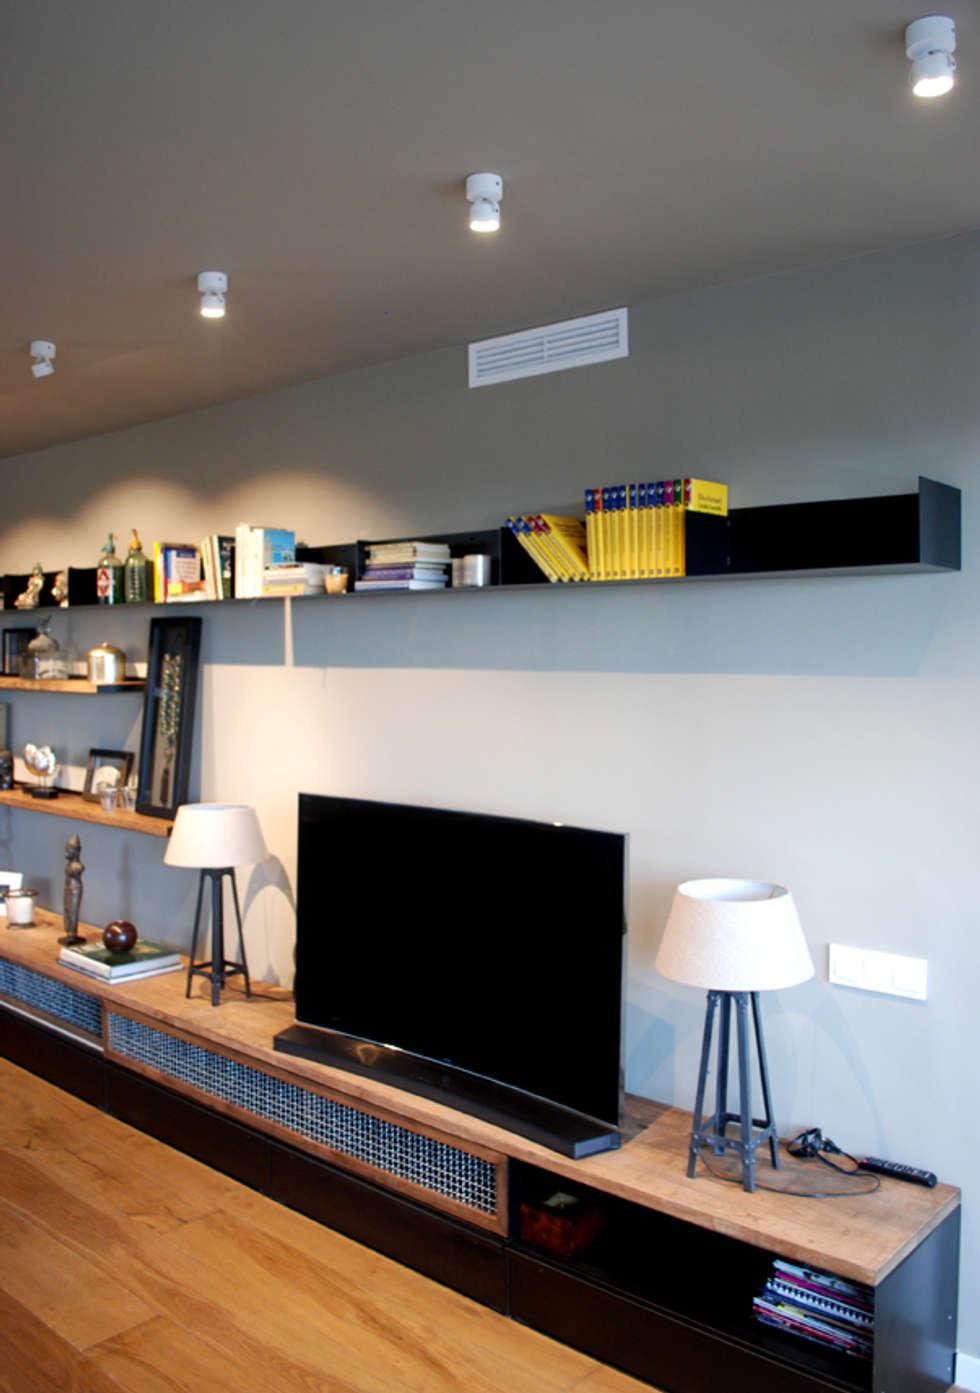 Fotos de decoraci n y dise o de interiores homify - Iluminacion salon moderno ...